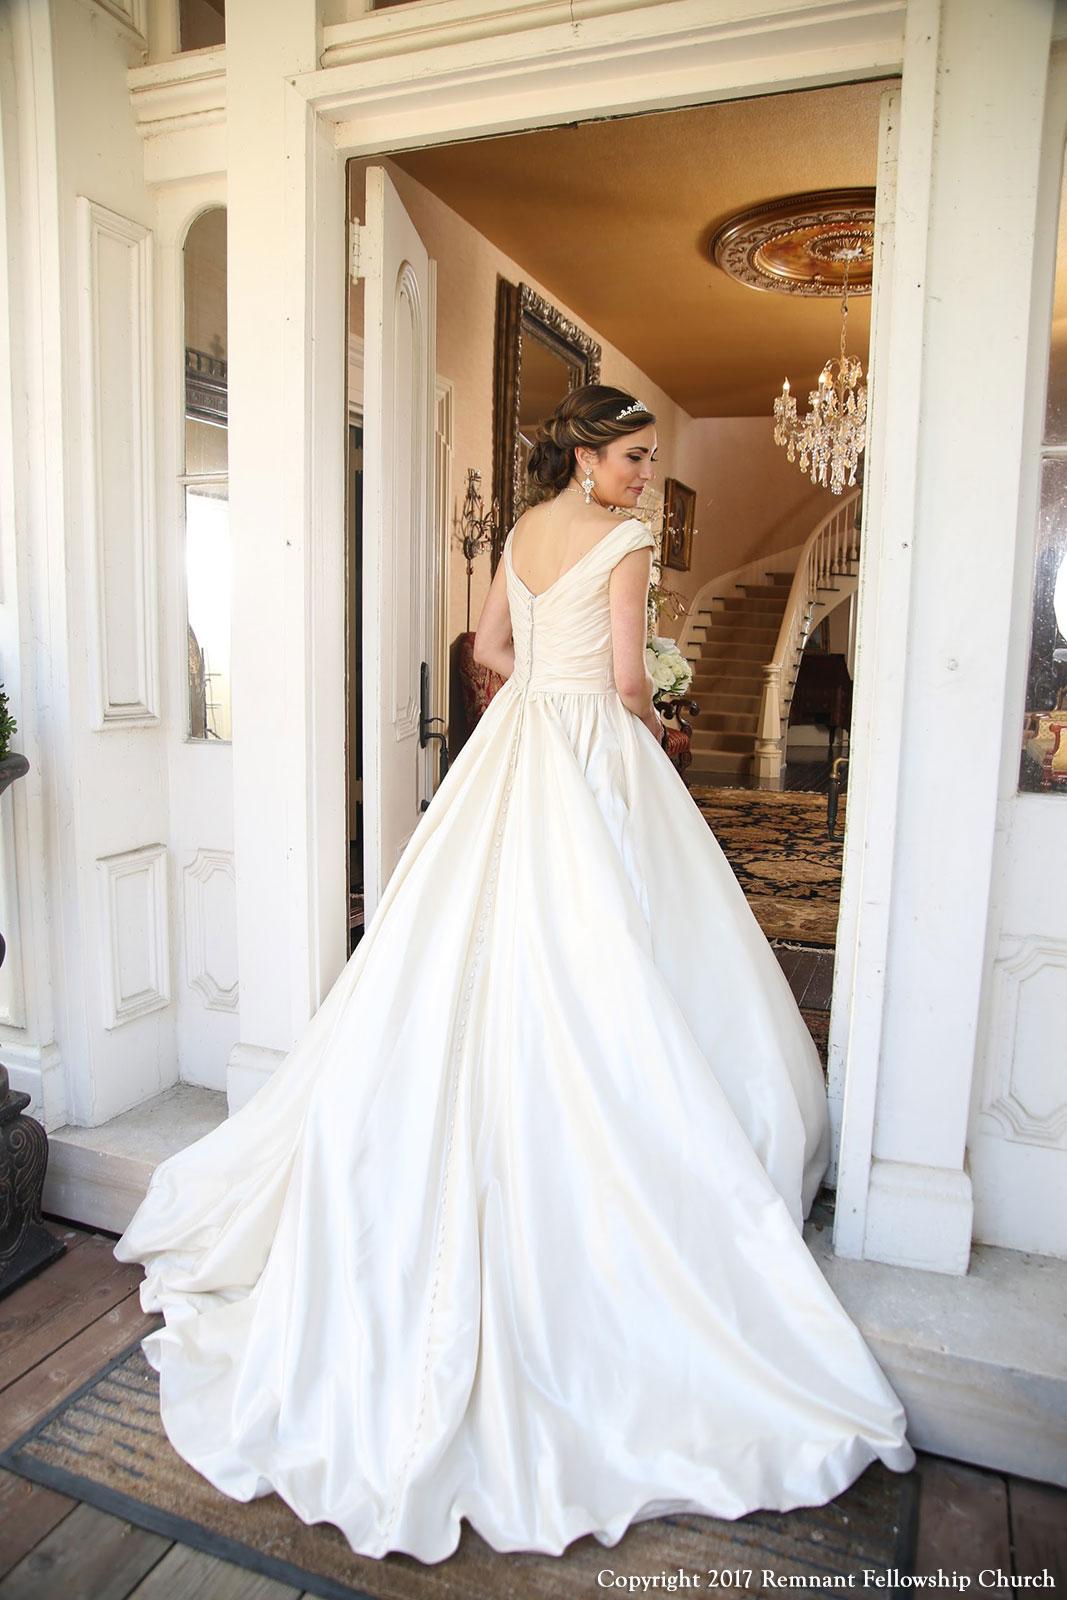 Wedding Dresses - Remnant Fellowship Weddings